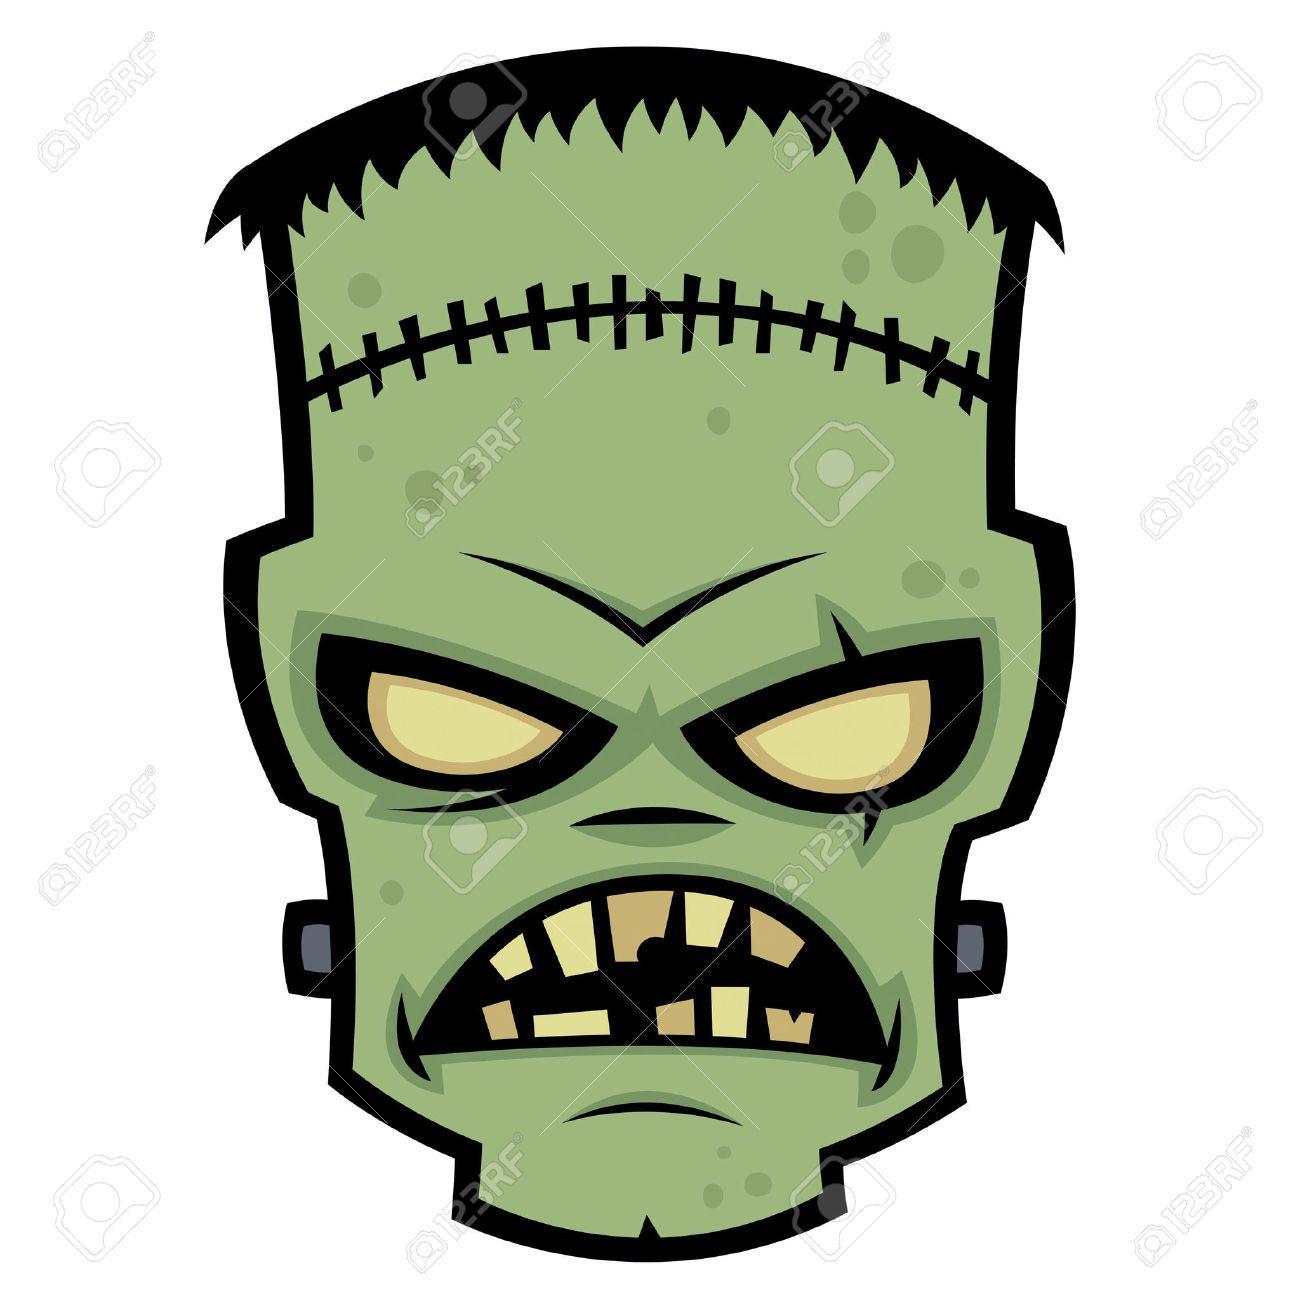 Frankenstein clipart vector. Stock illustration and royalty